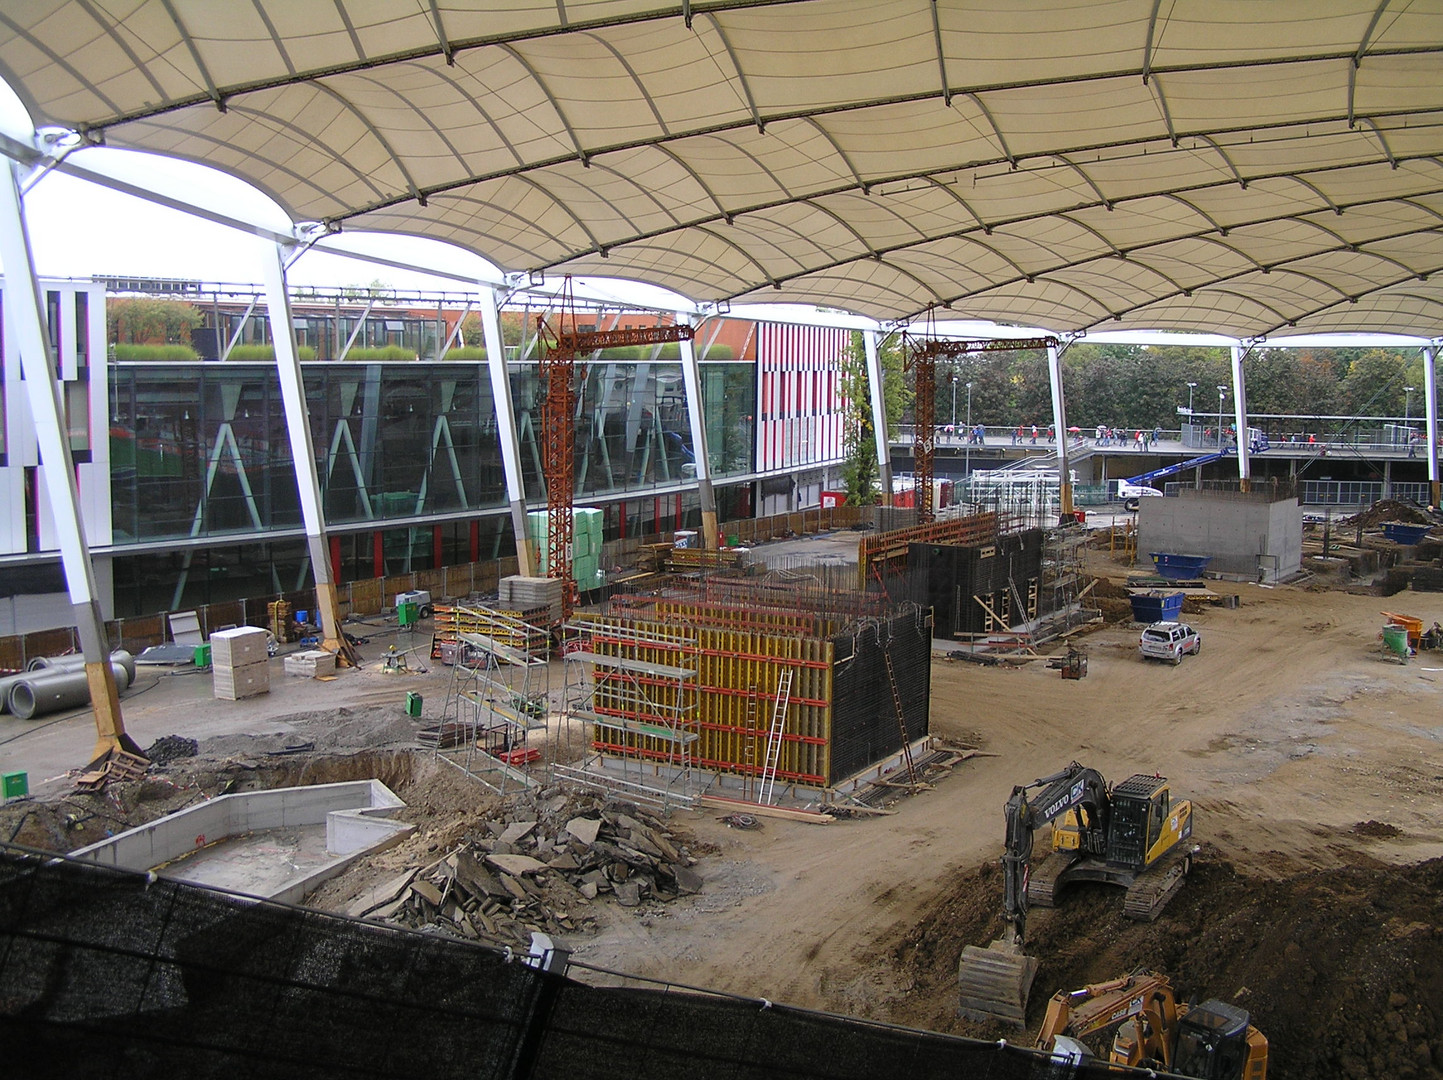 Baustelle Cannstatter Kurve (Mercedes-Benz-Arena - Stuttgart) 25.09.2010 -3-